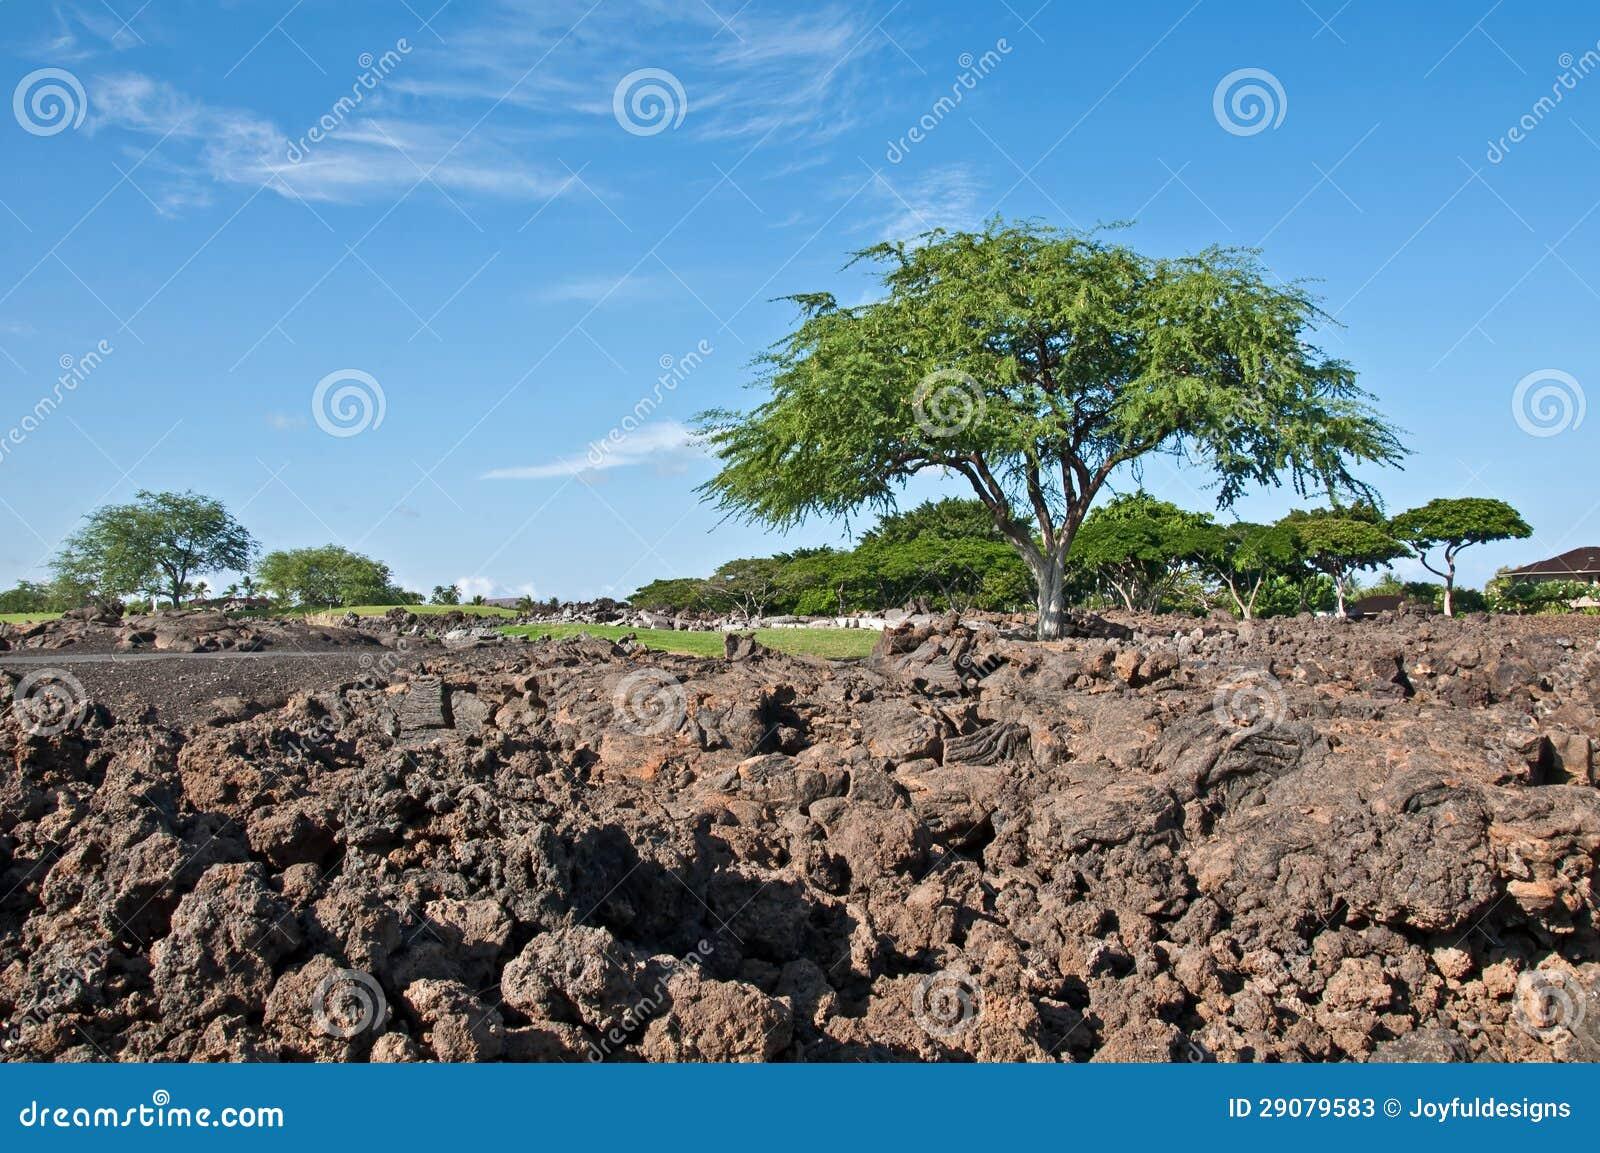 Landscaping Boulders Houston : Design ideas landscaping lava rocks in houston